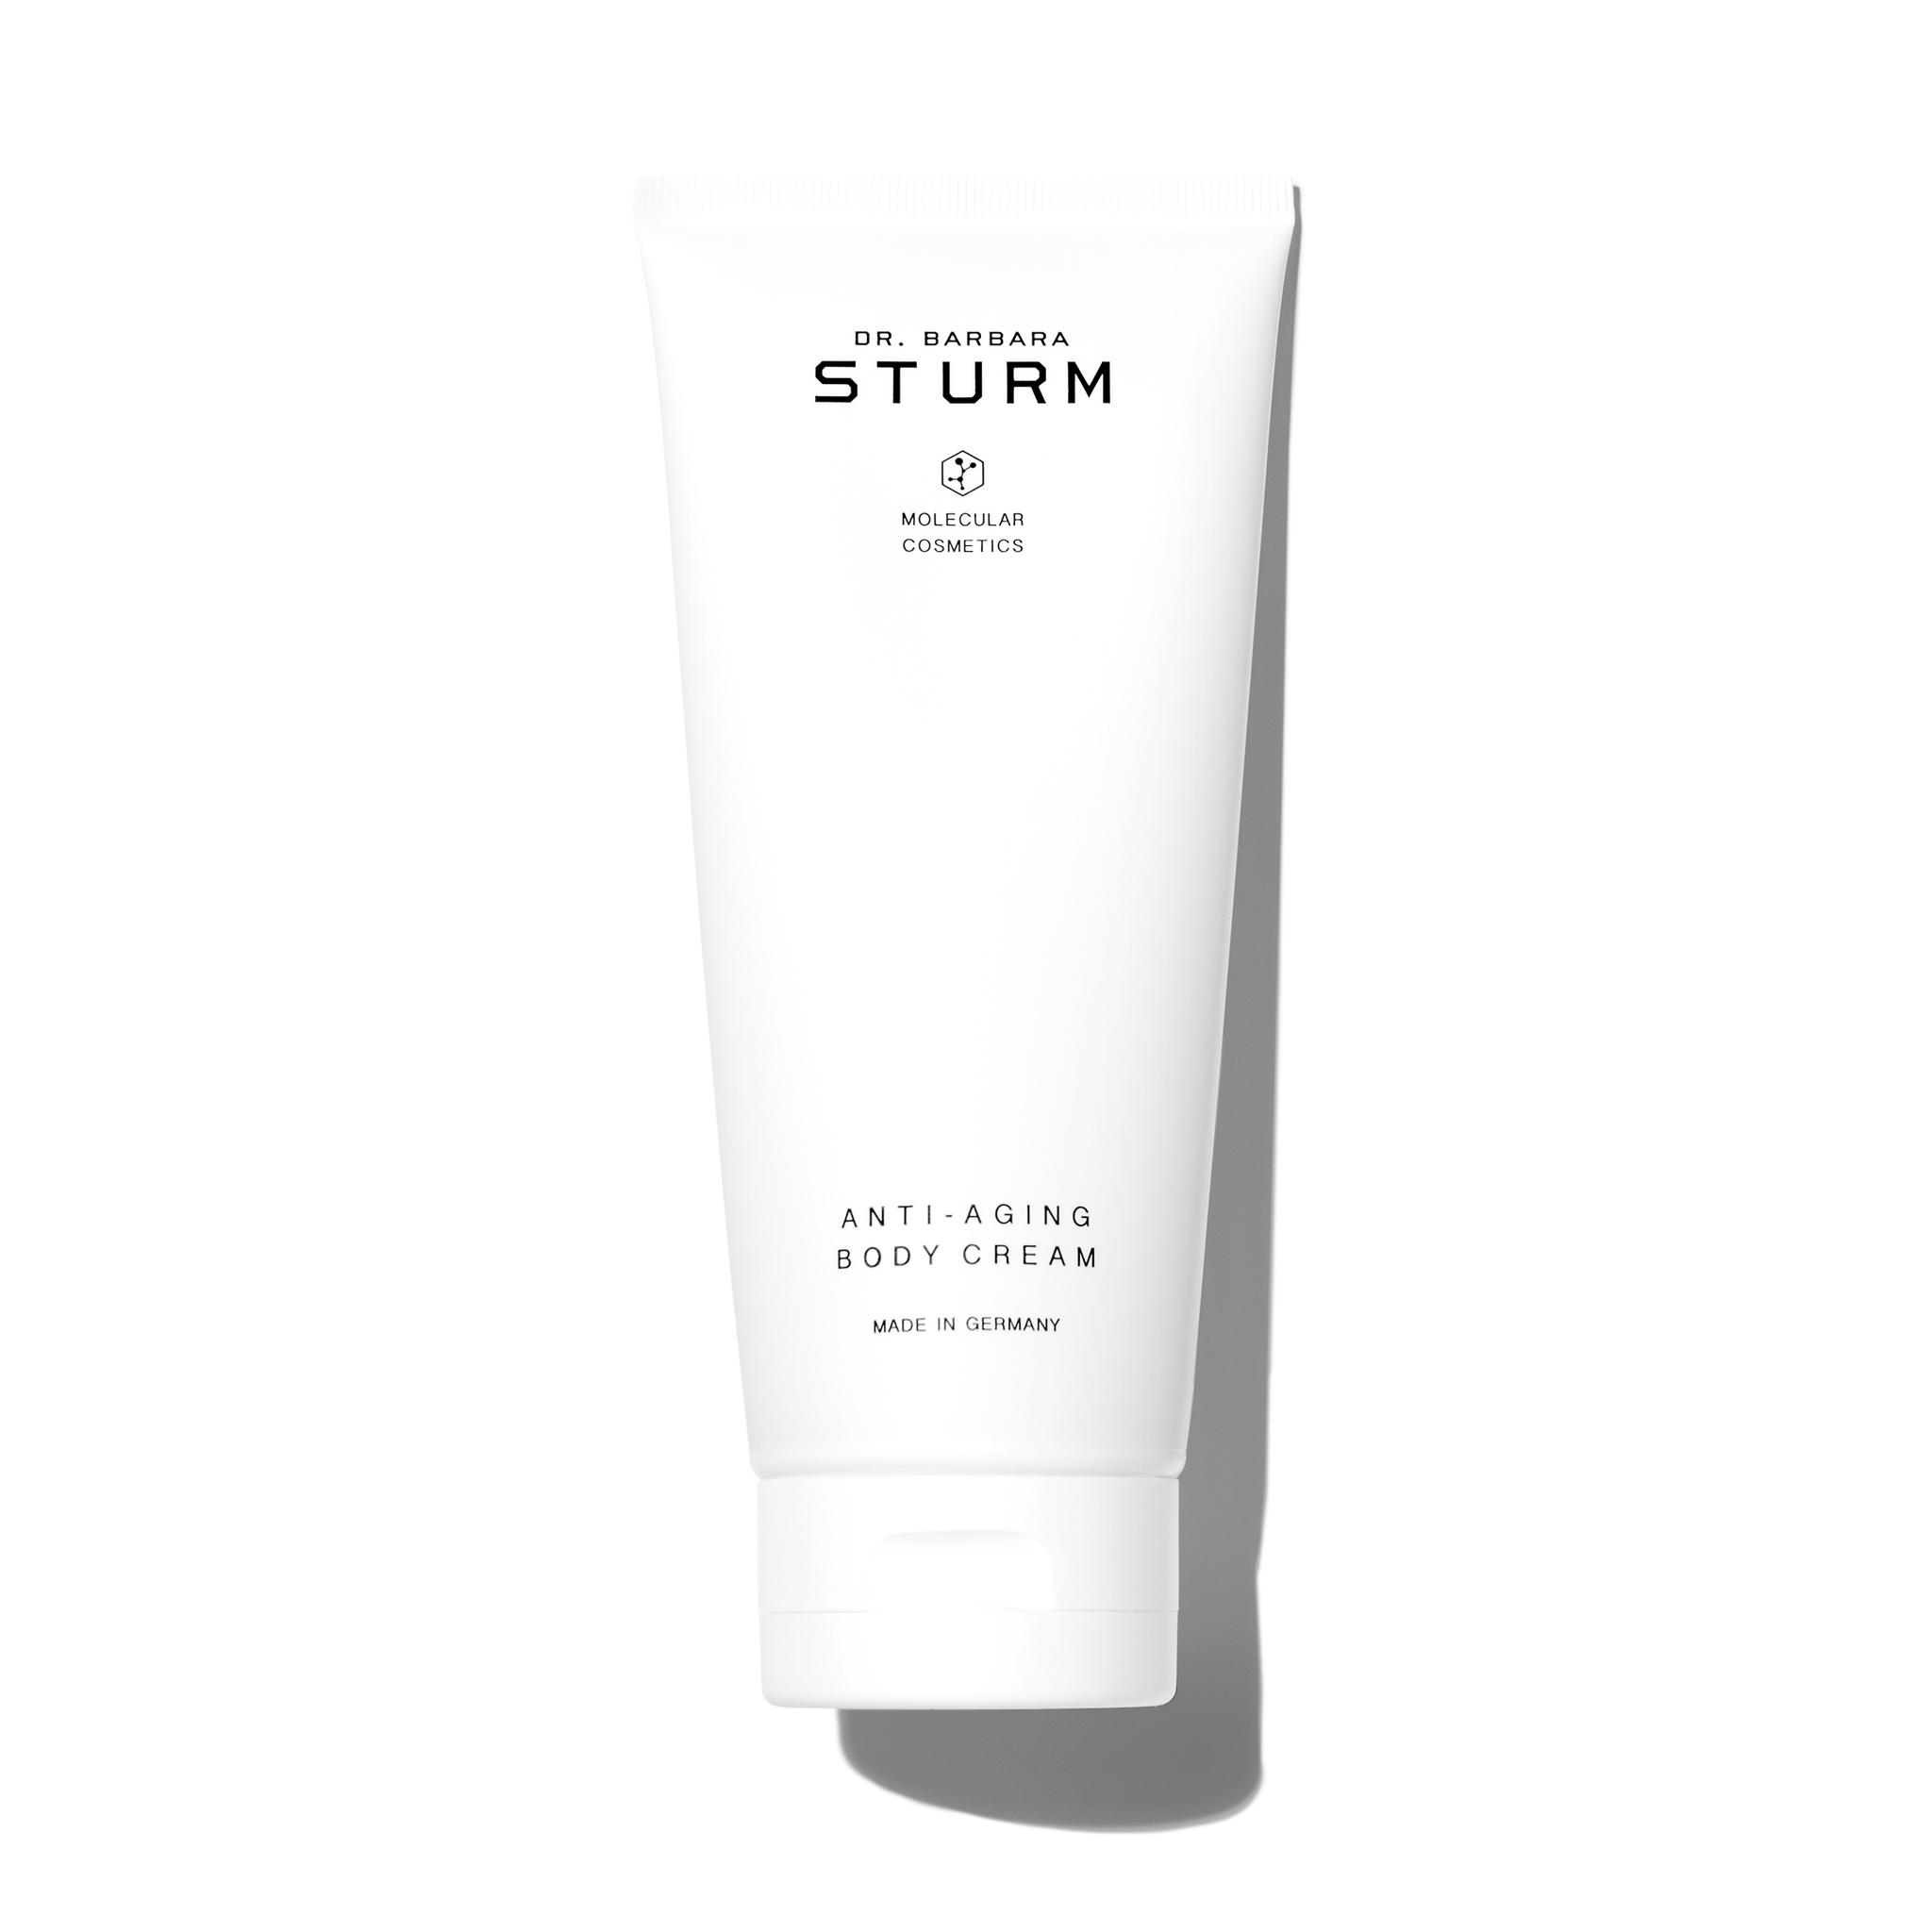 Крем для тела увлажняющий Dr. BARBARA STURM для упругости и эластичности кожи 200 мл